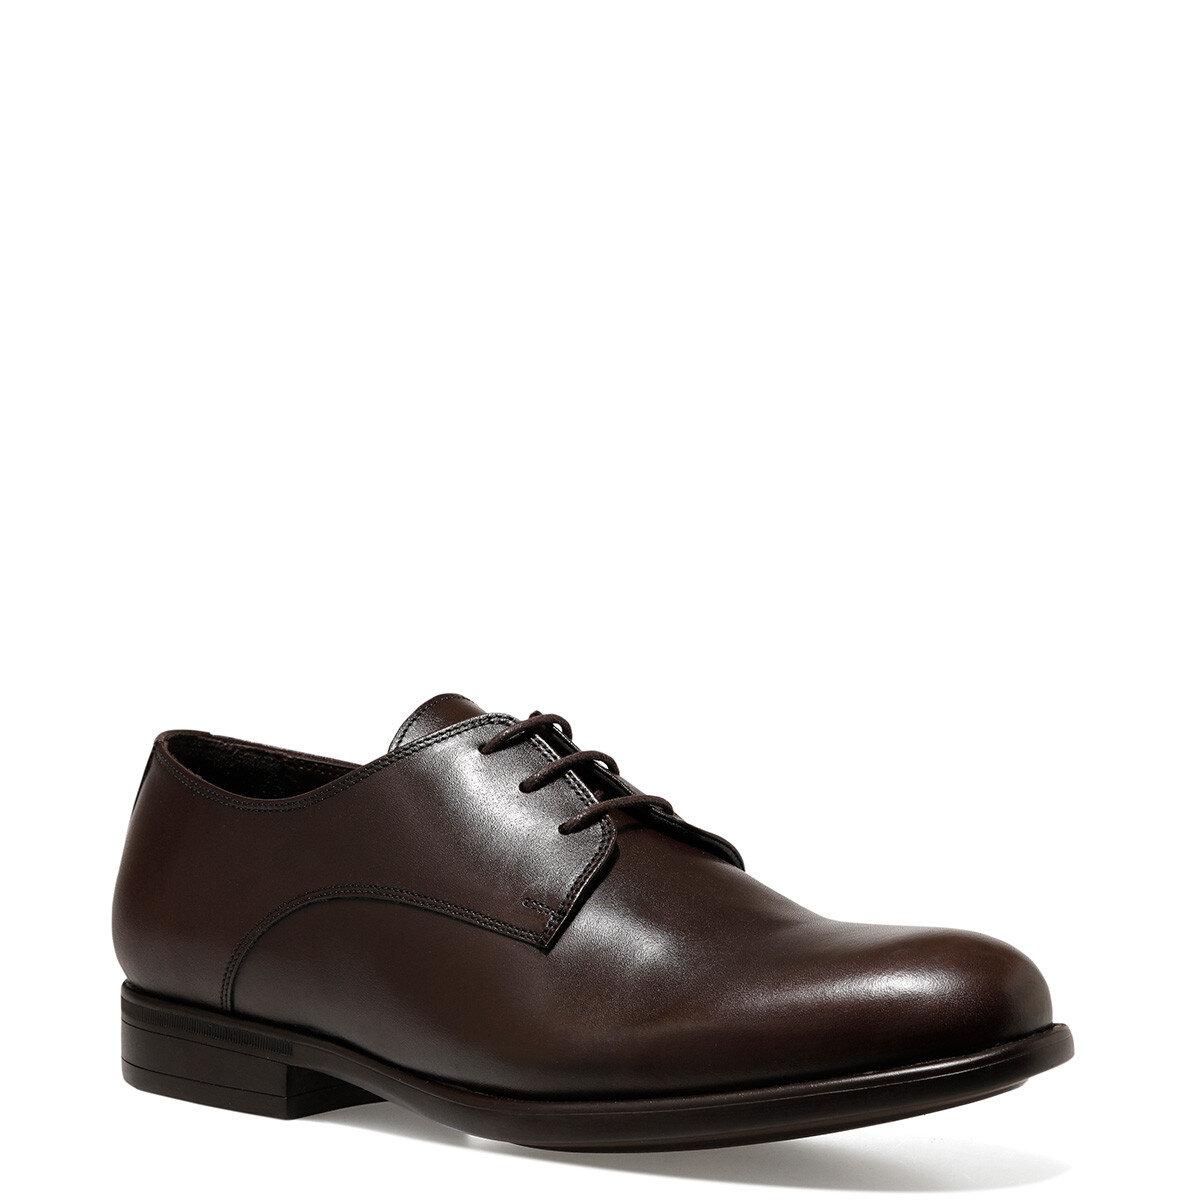 MATTEO Kahverengi Erkek Klasik Ayakkabı